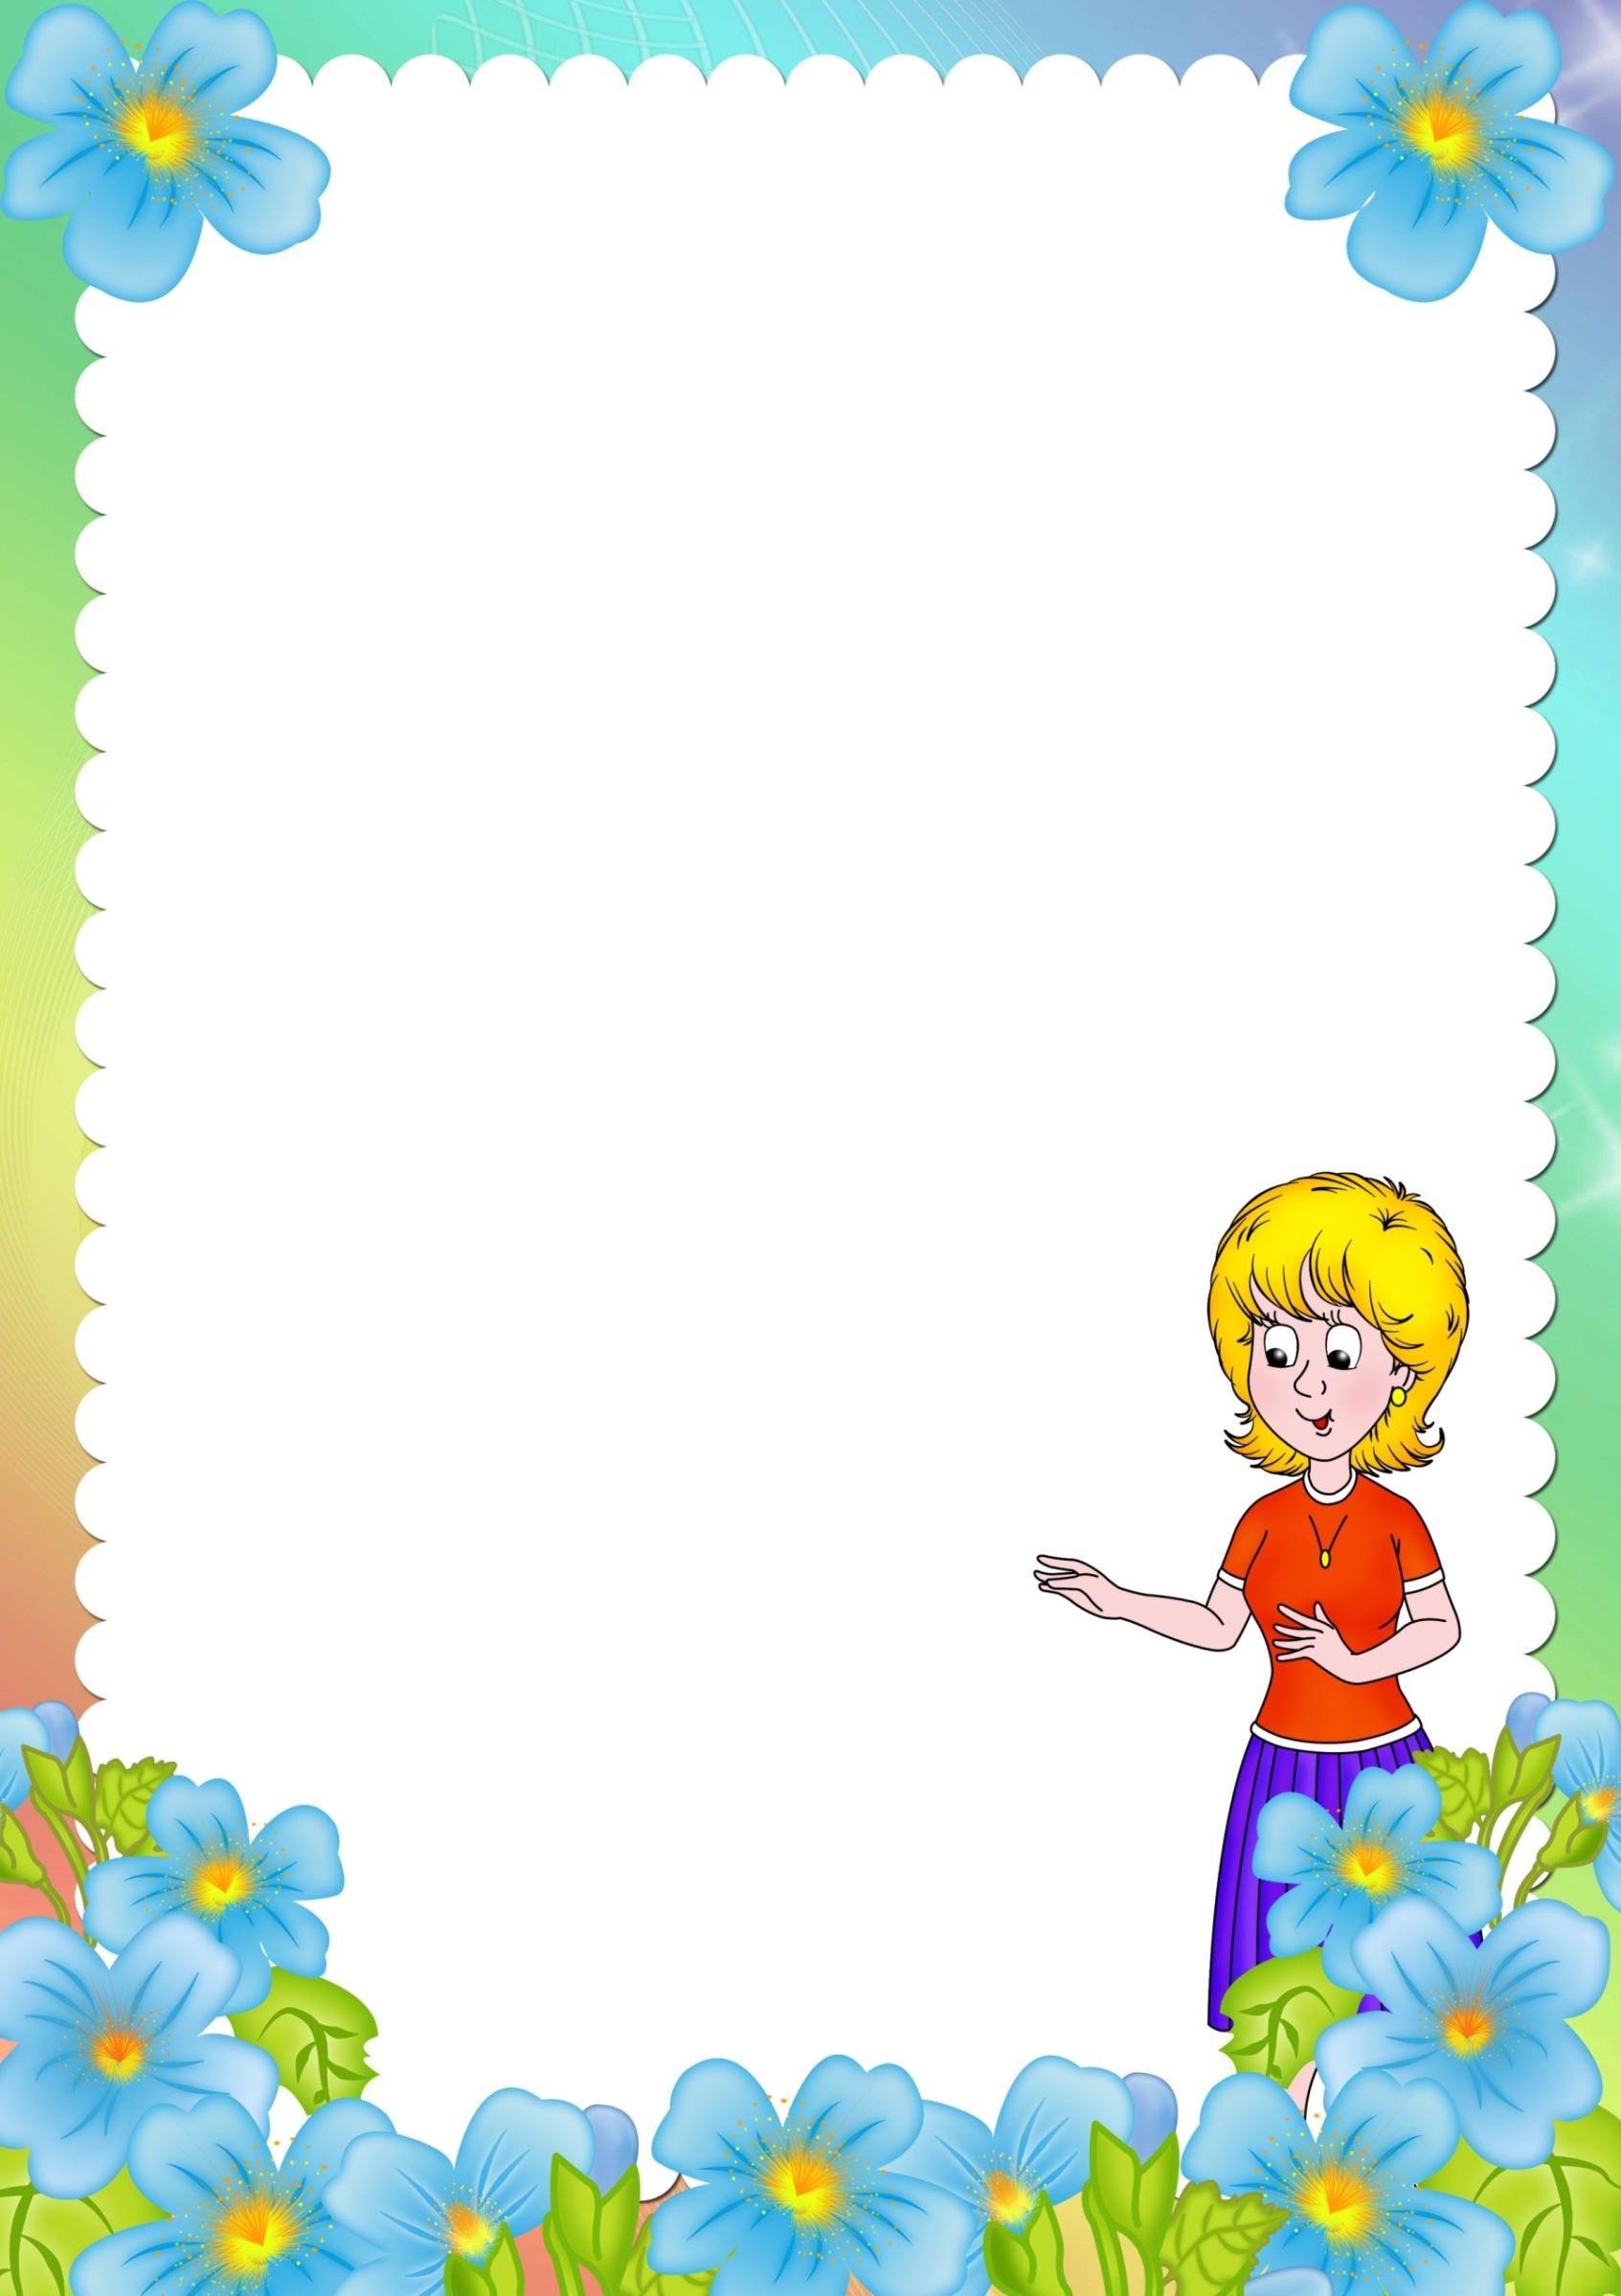 3860_html_m4741b0d6.jpg